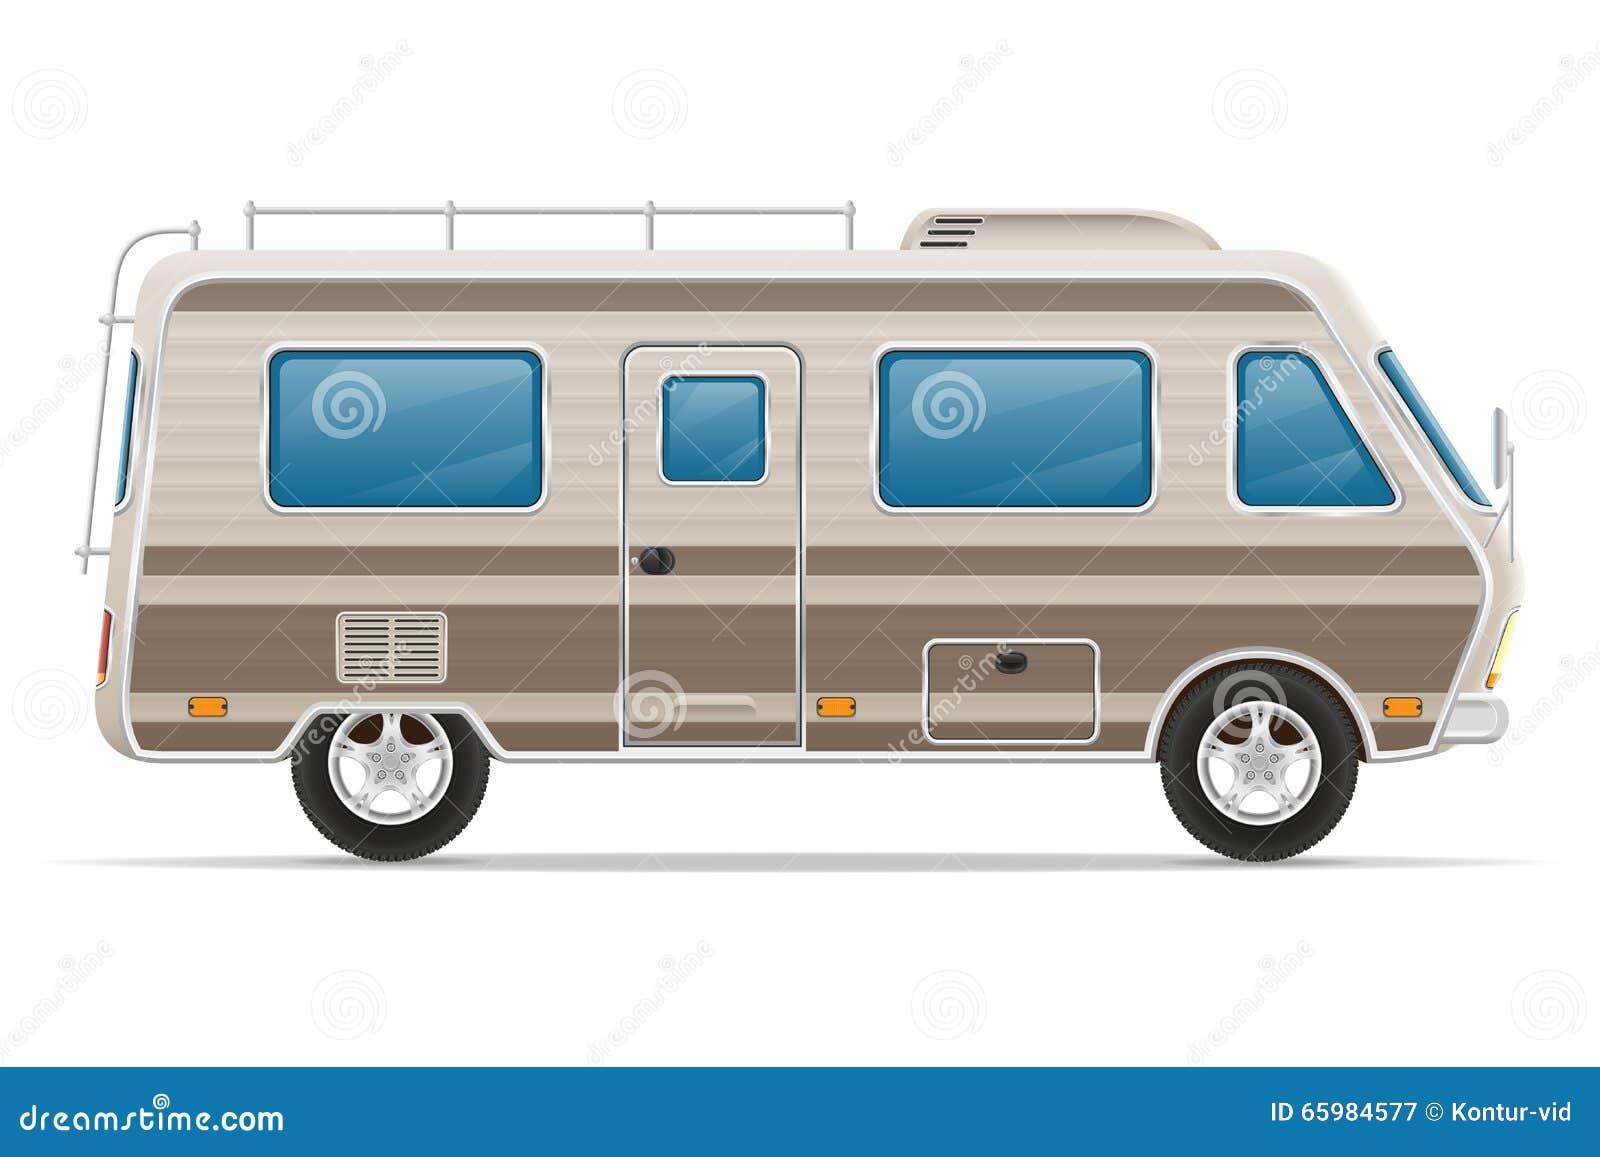 Camper van illustration stock illustration cartoondealer - Costo casa mobile ...